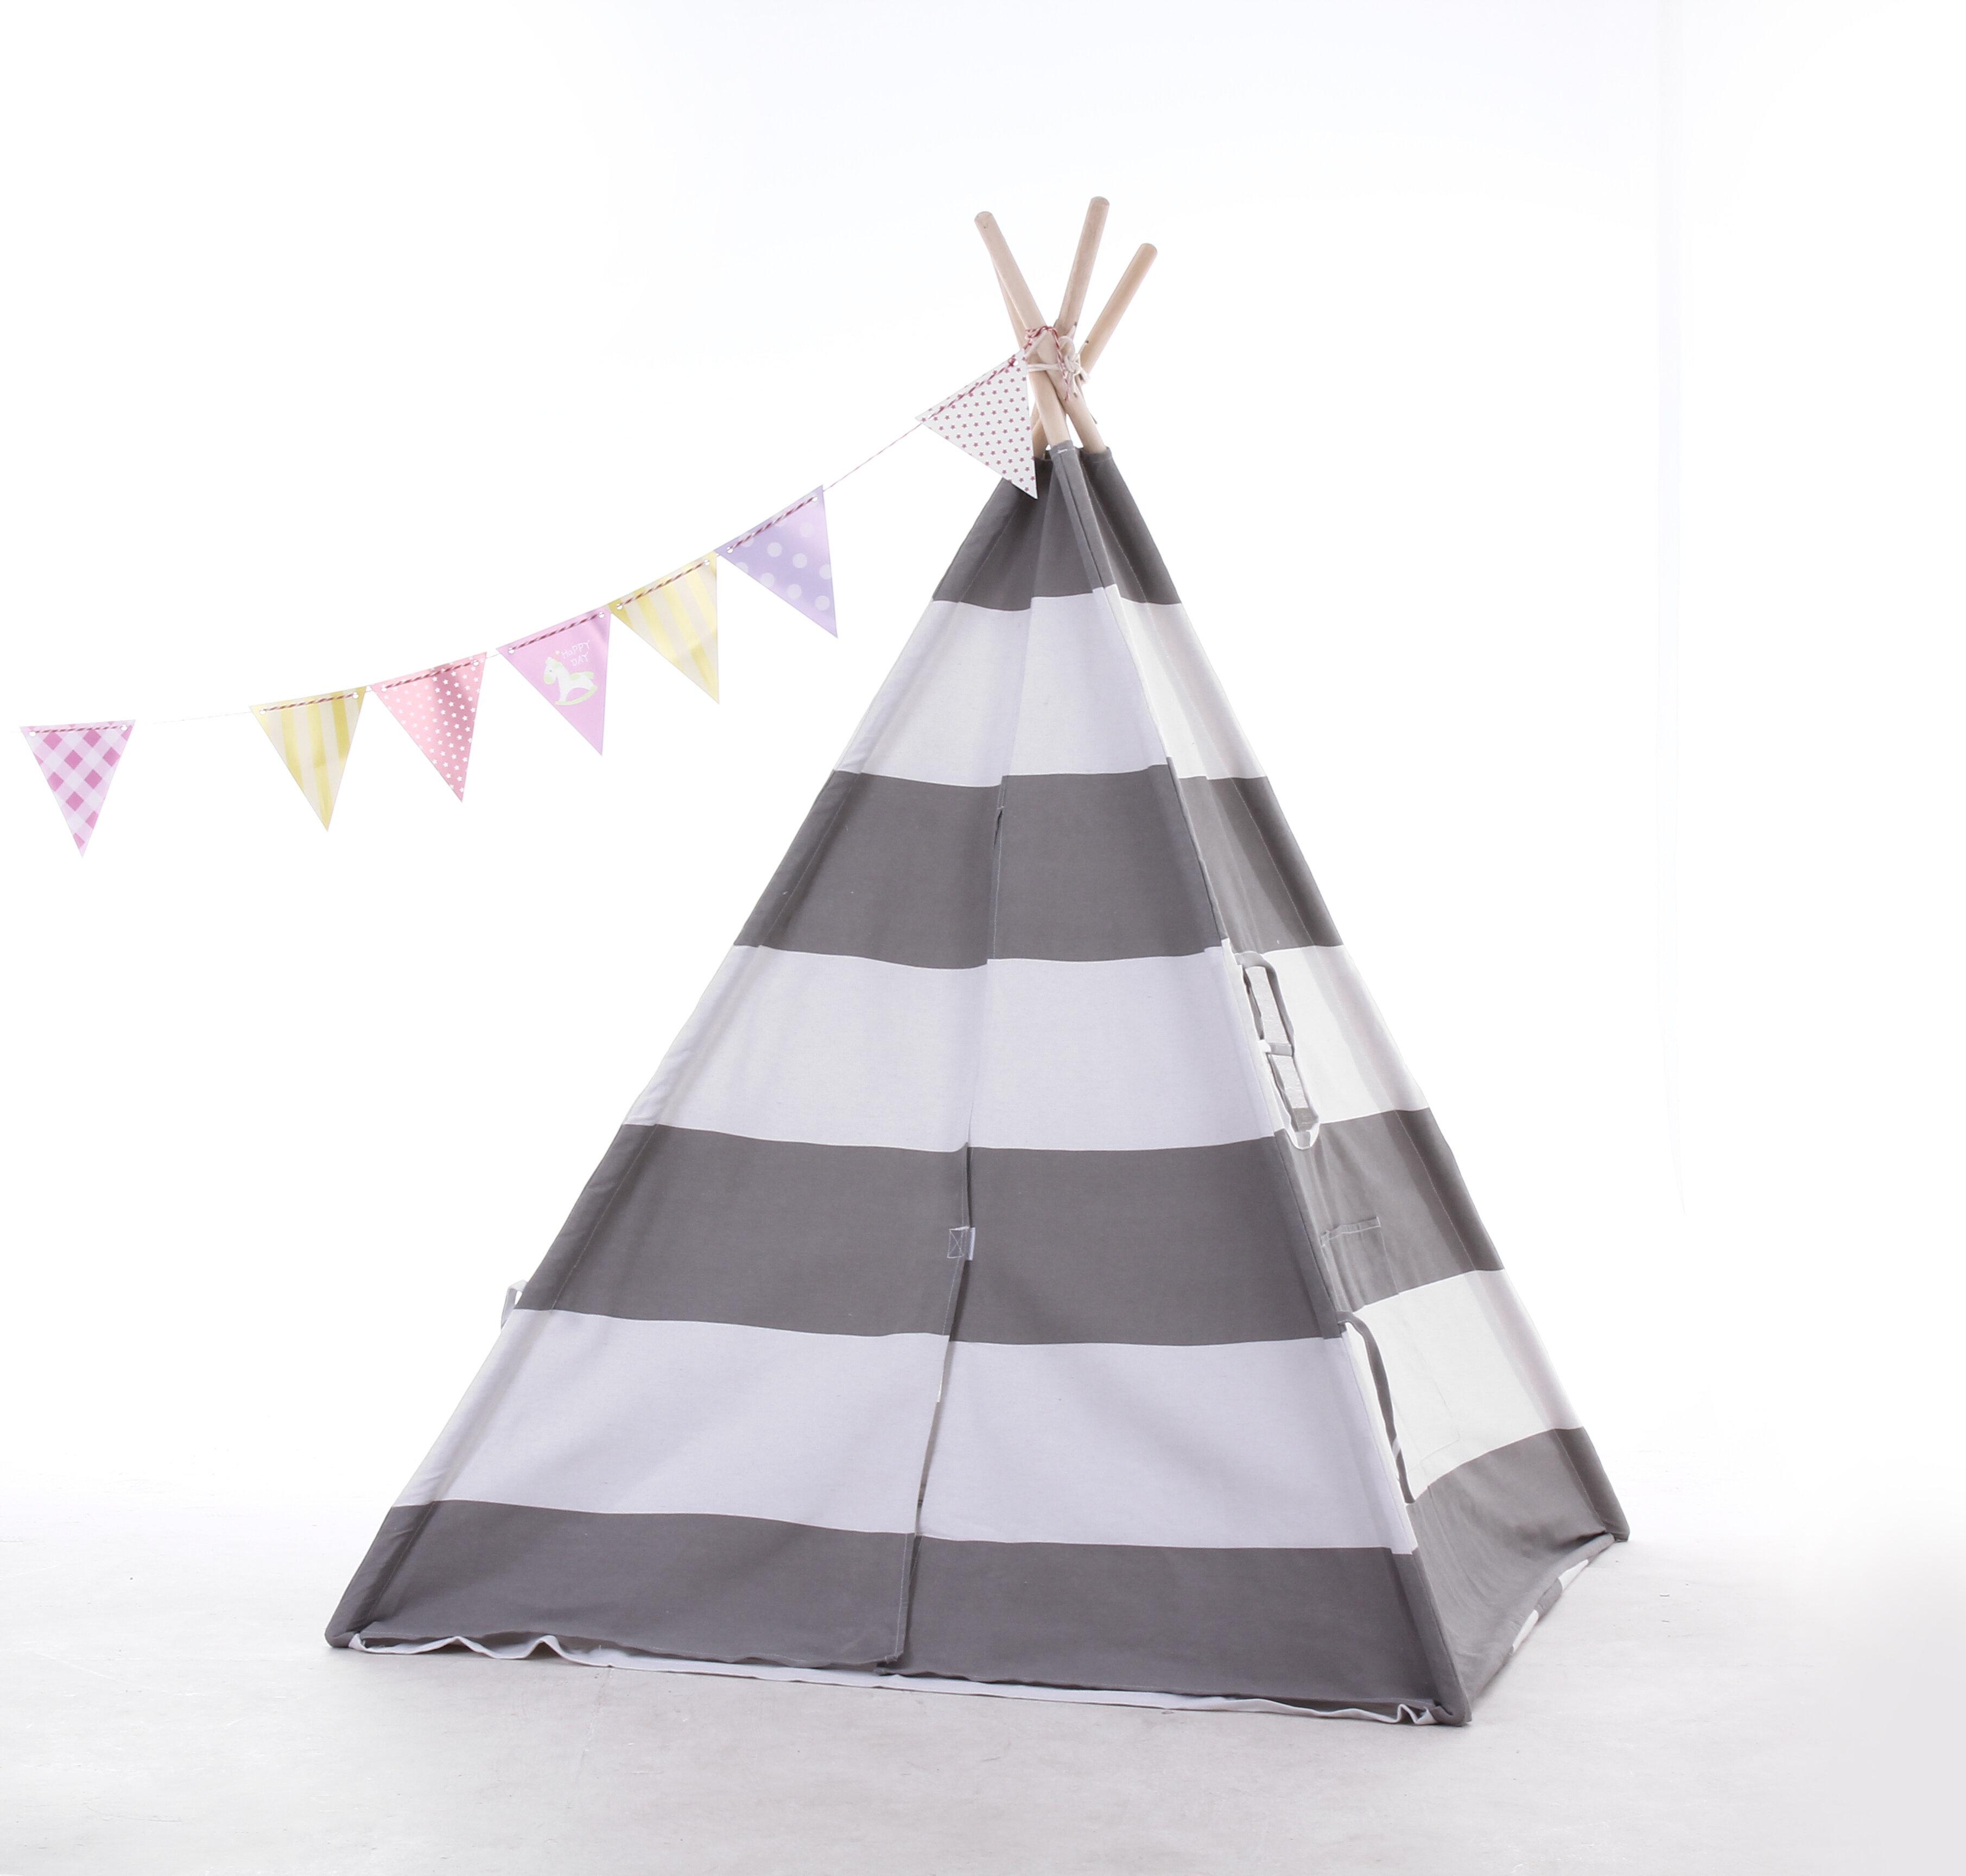 E Joy 4 X 4 Indoor Canvas Triangular Play Tent With Carrying Bag Reviews Wayfair